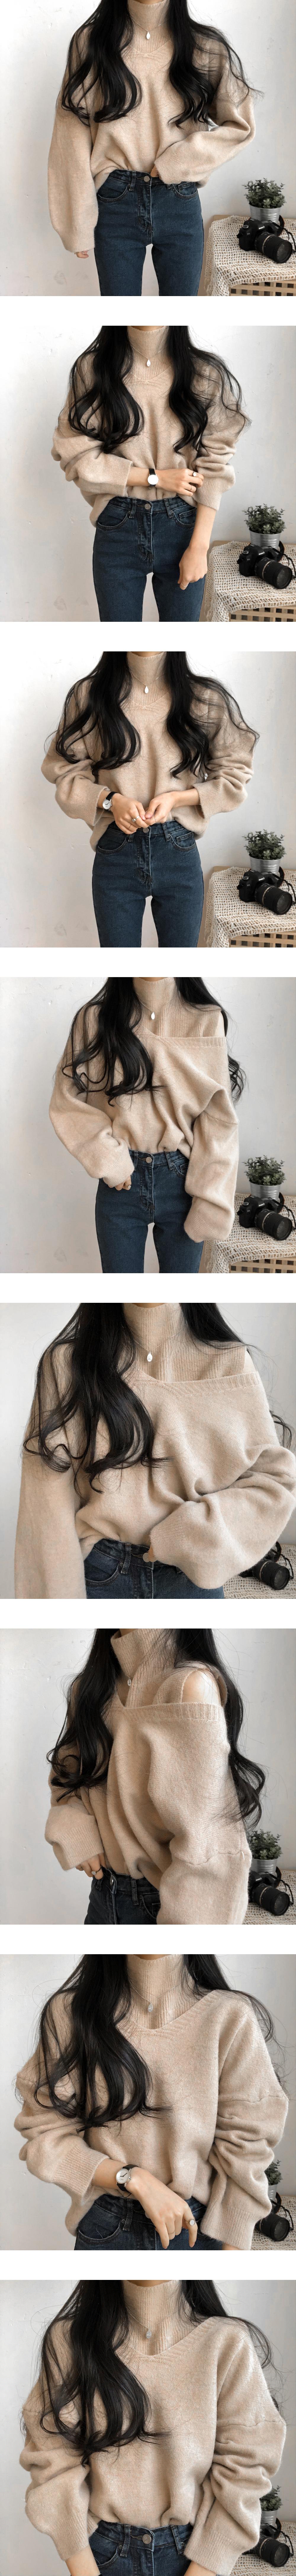 jacket detail image-S1L6